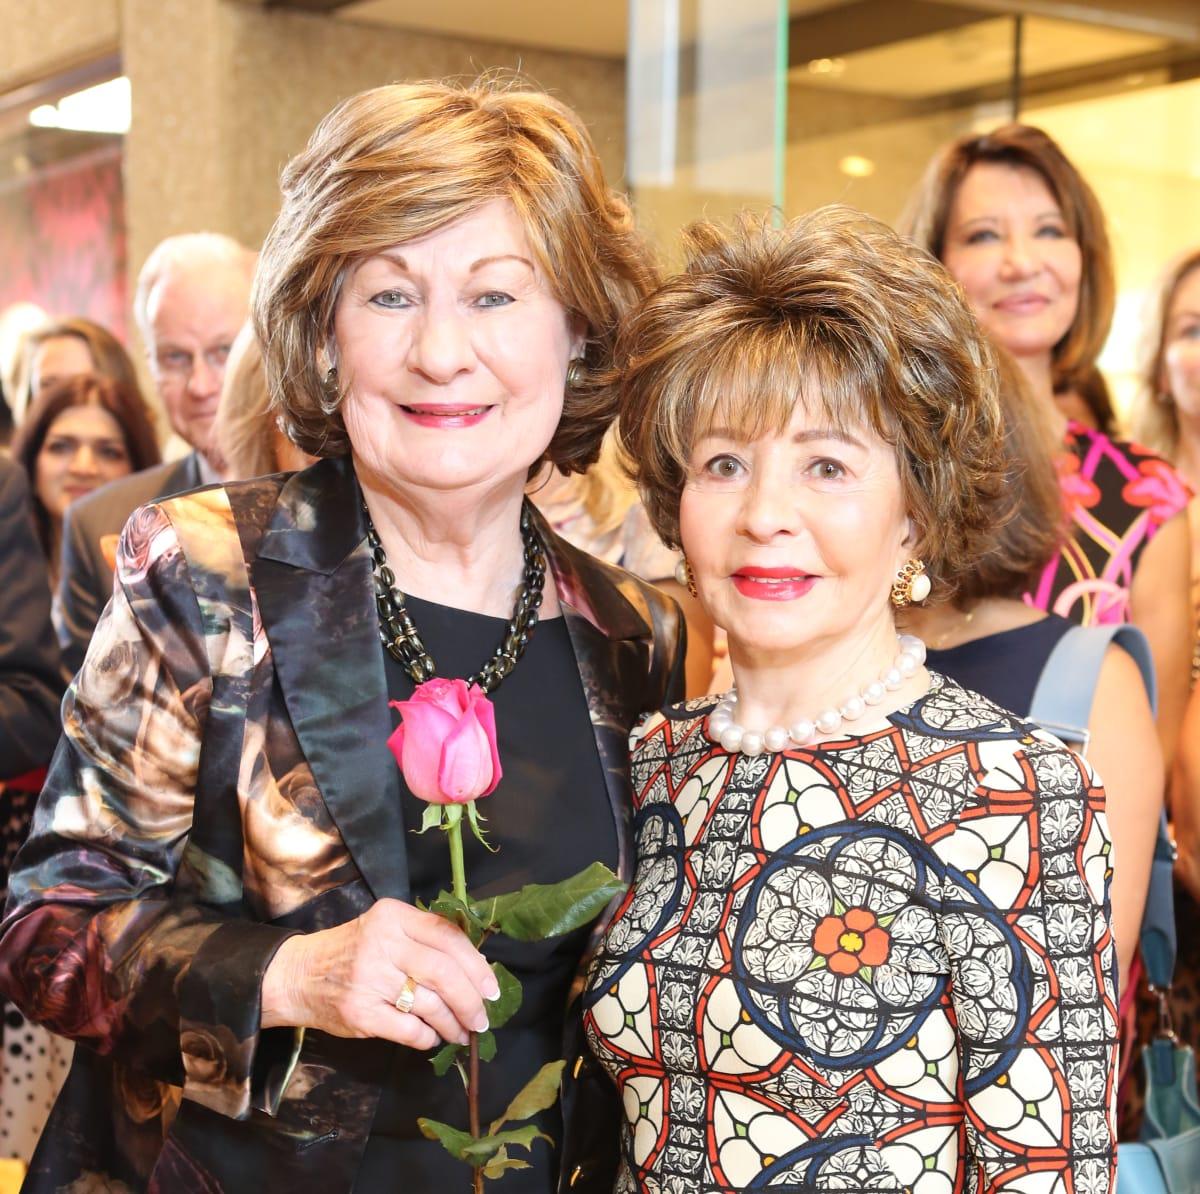 News, Shelby, Stiletto Strut, Sept. 2015 Cora Sue Mach, Barbara LeGrange